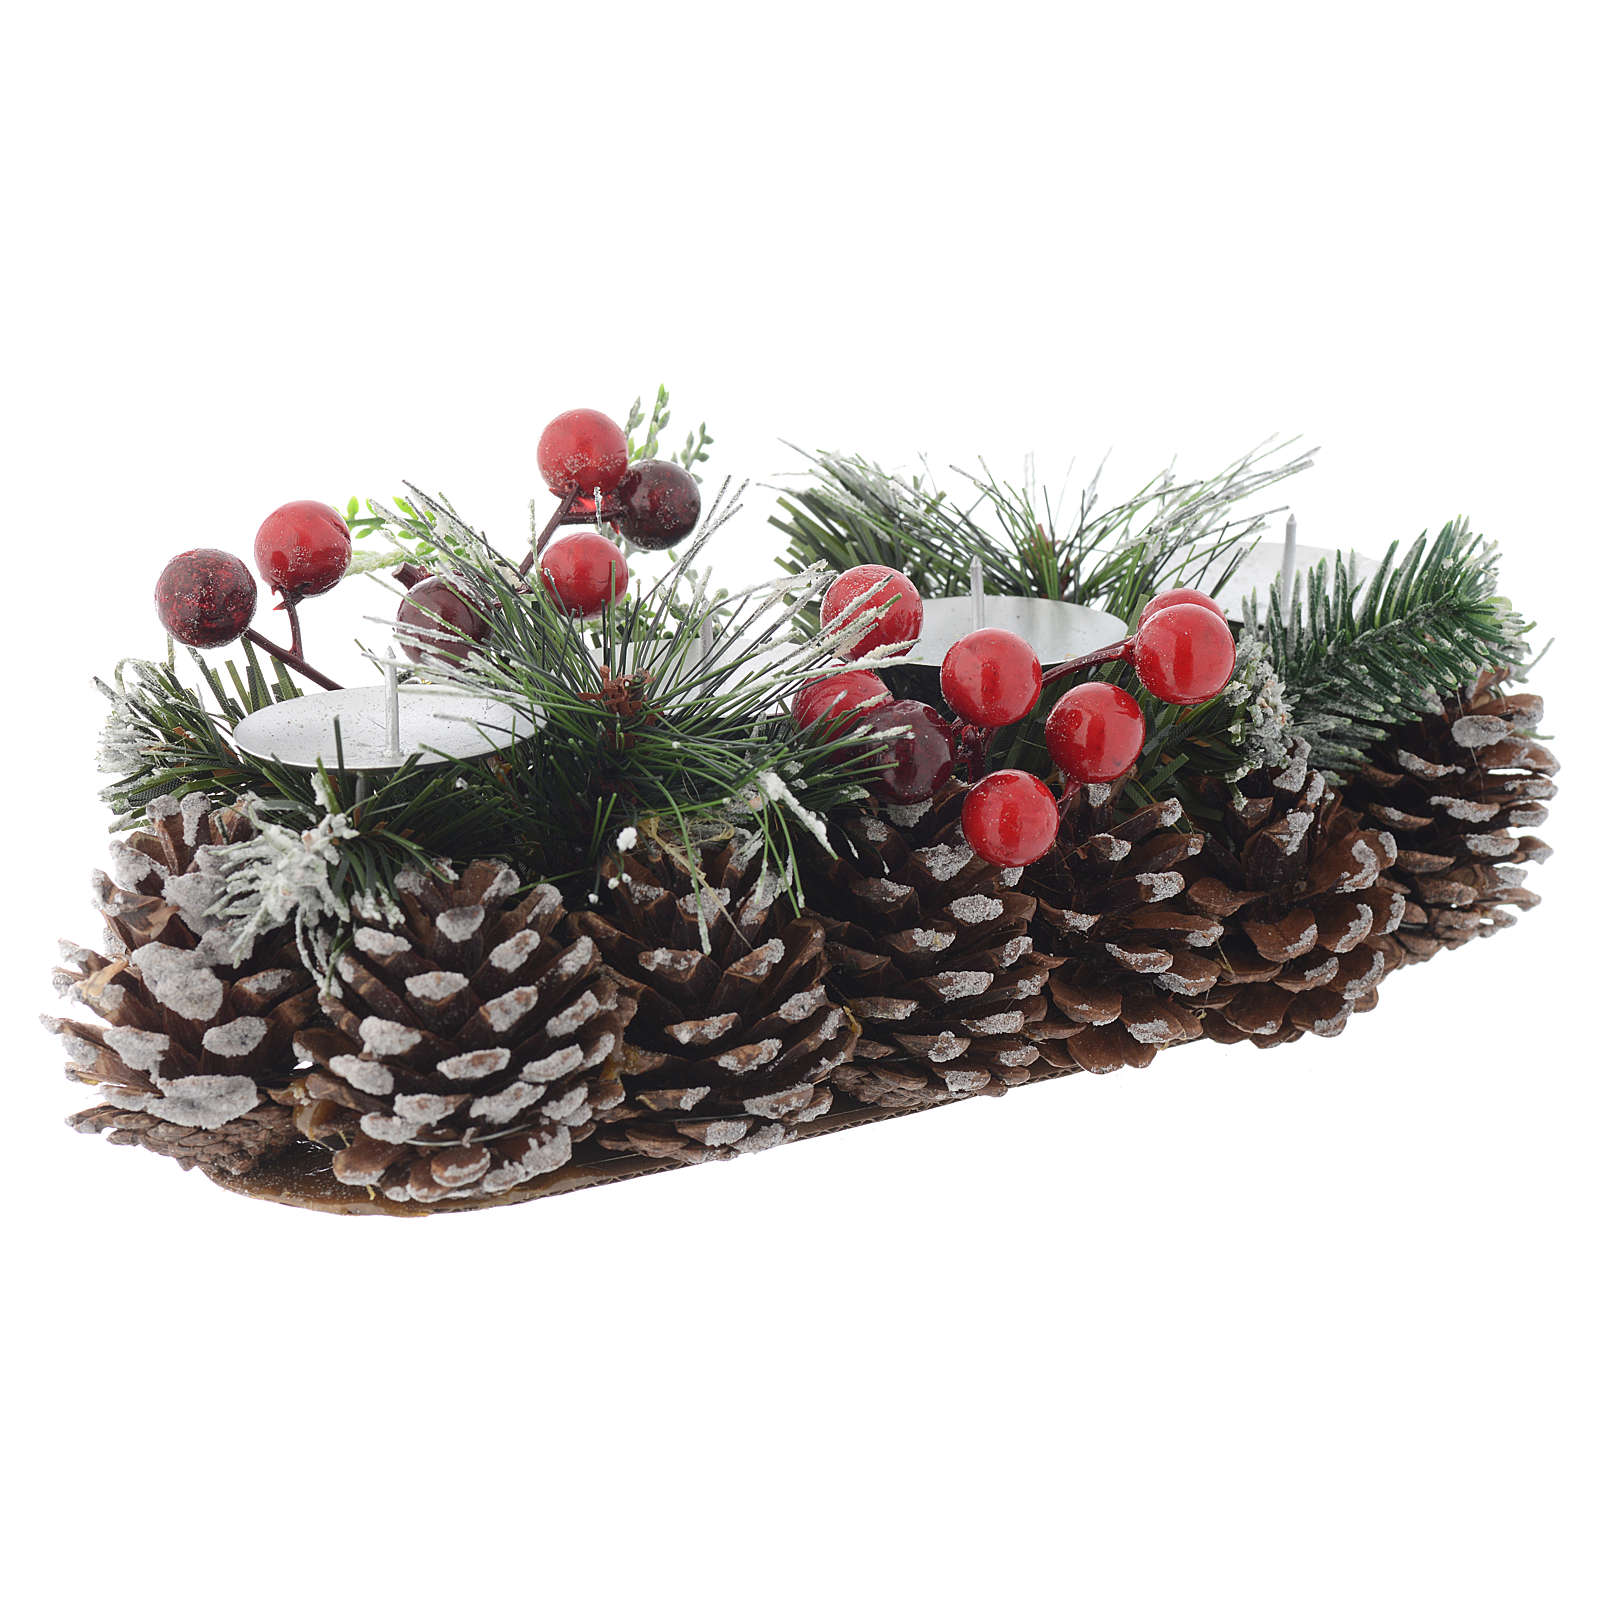 Centrotavola Avvento Natale portacandela per 4 candele 3